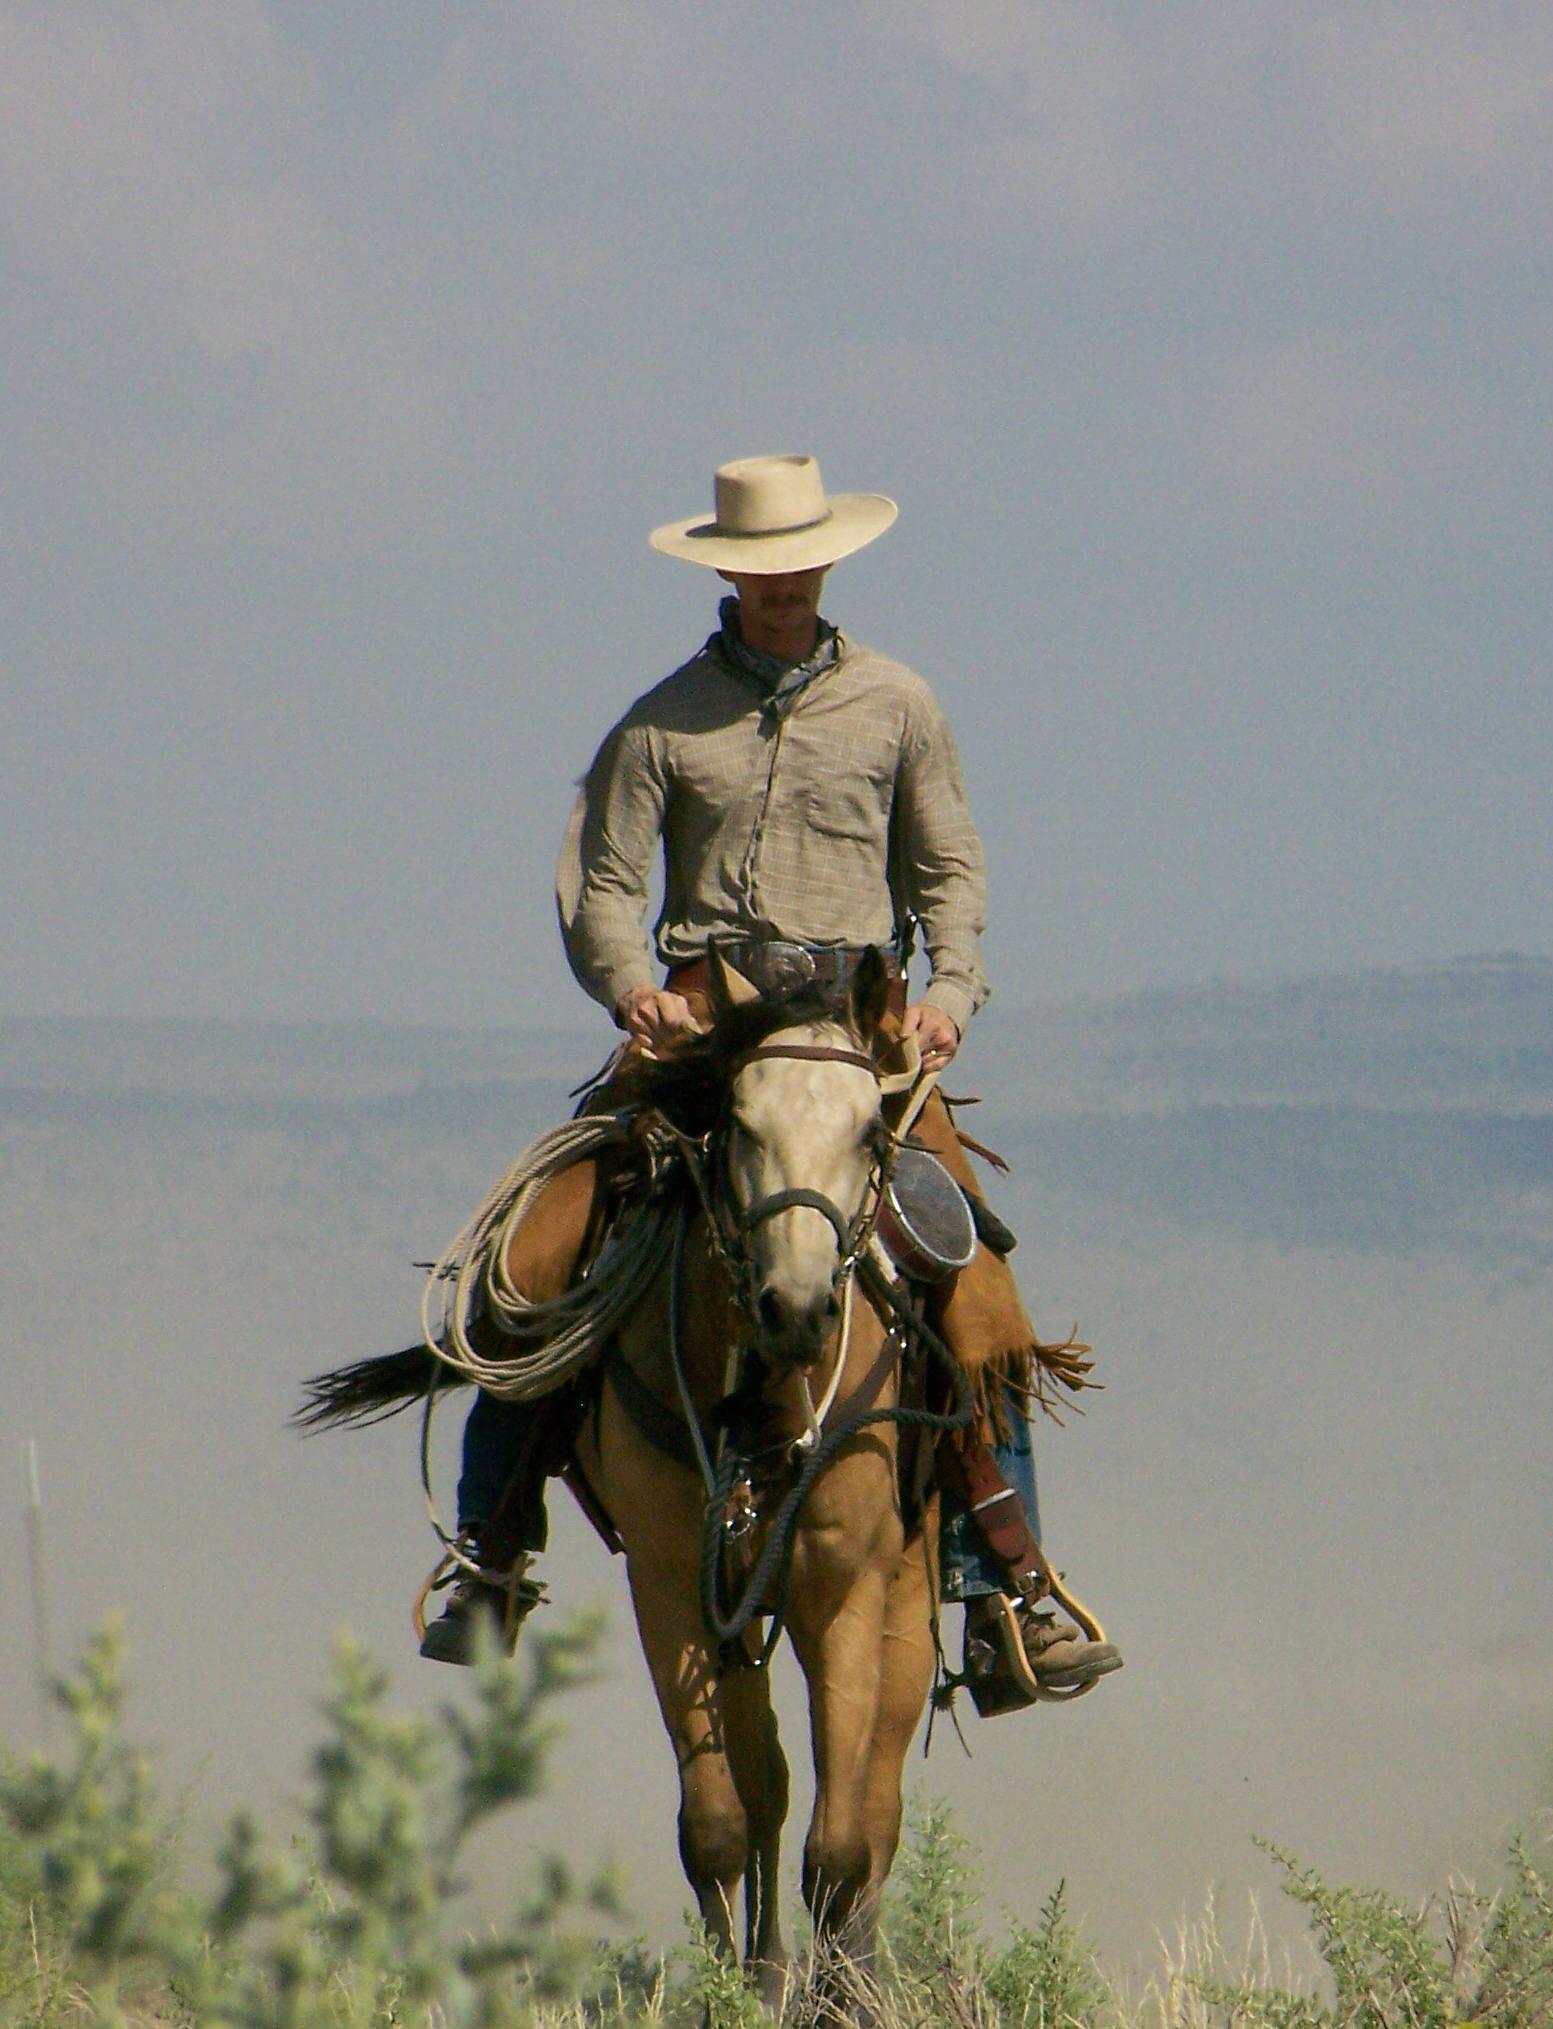 Https Www Pinterest Com Schoolhouselife Ride Em Cowboy